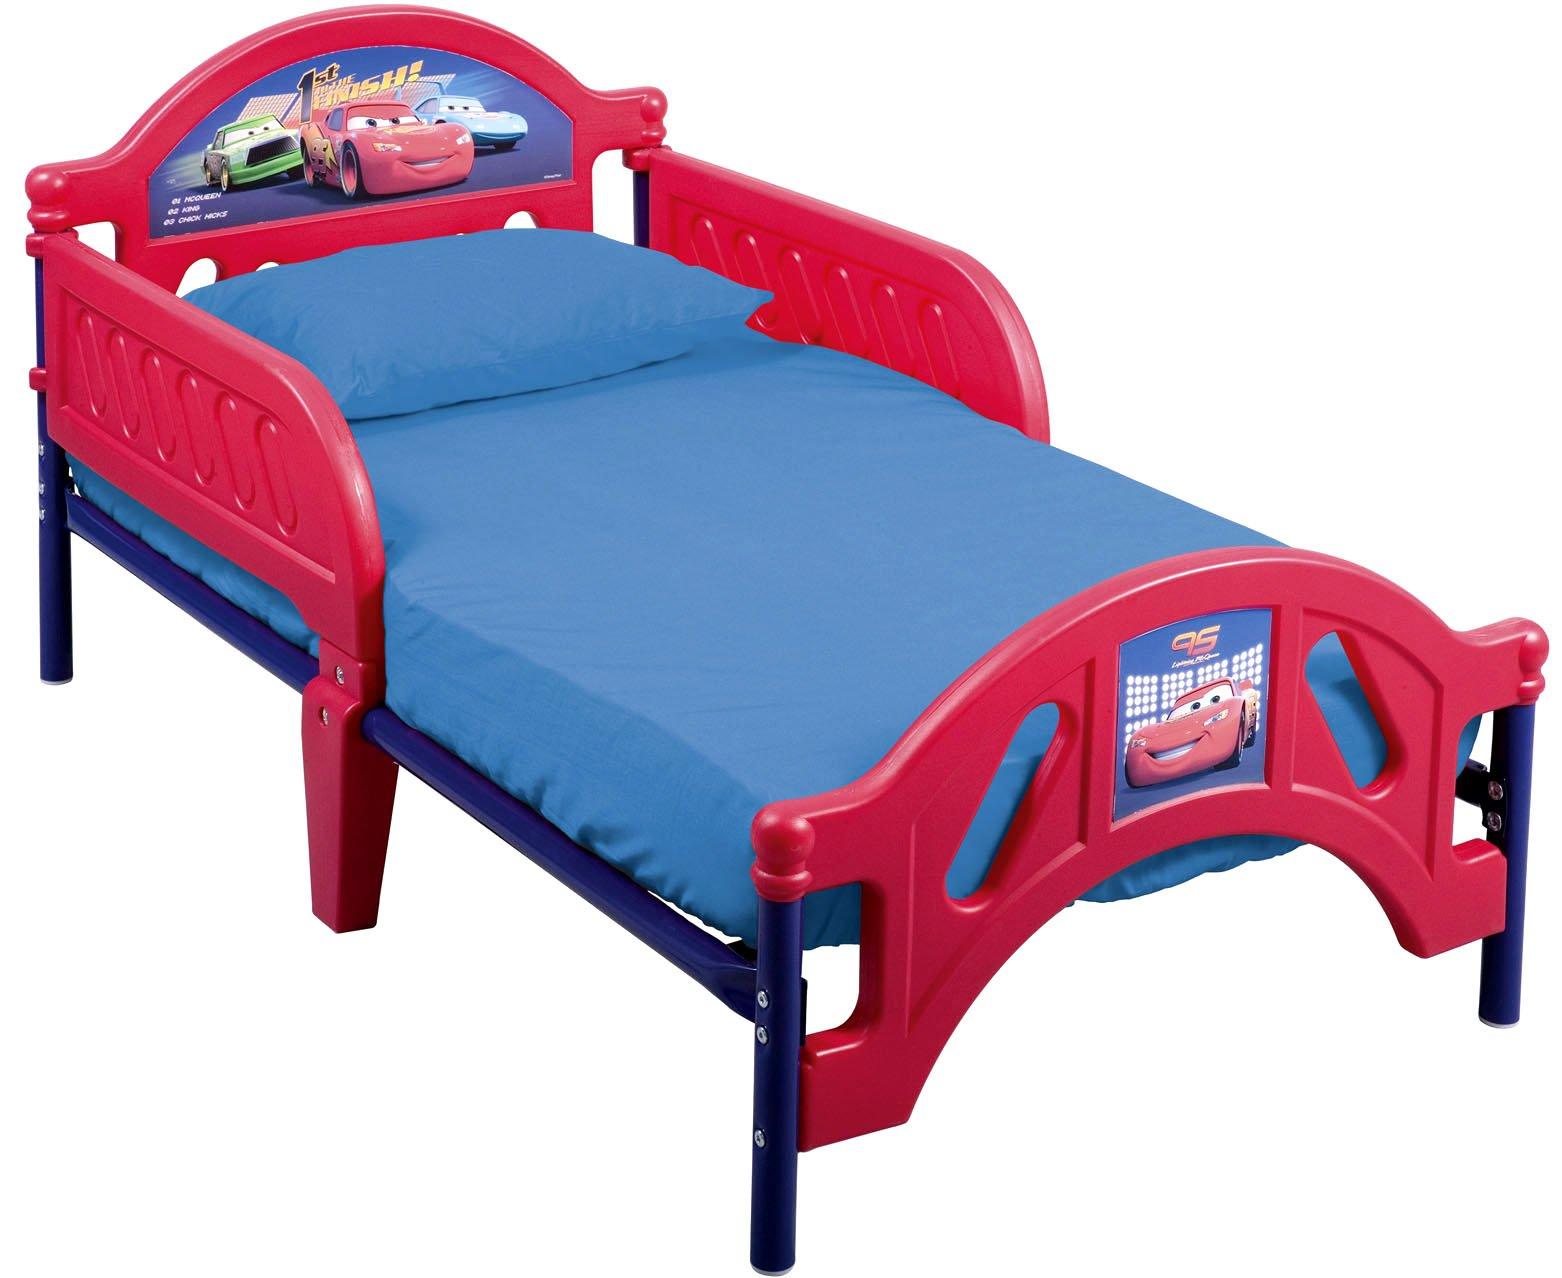 Delta Cars Toddler Bed